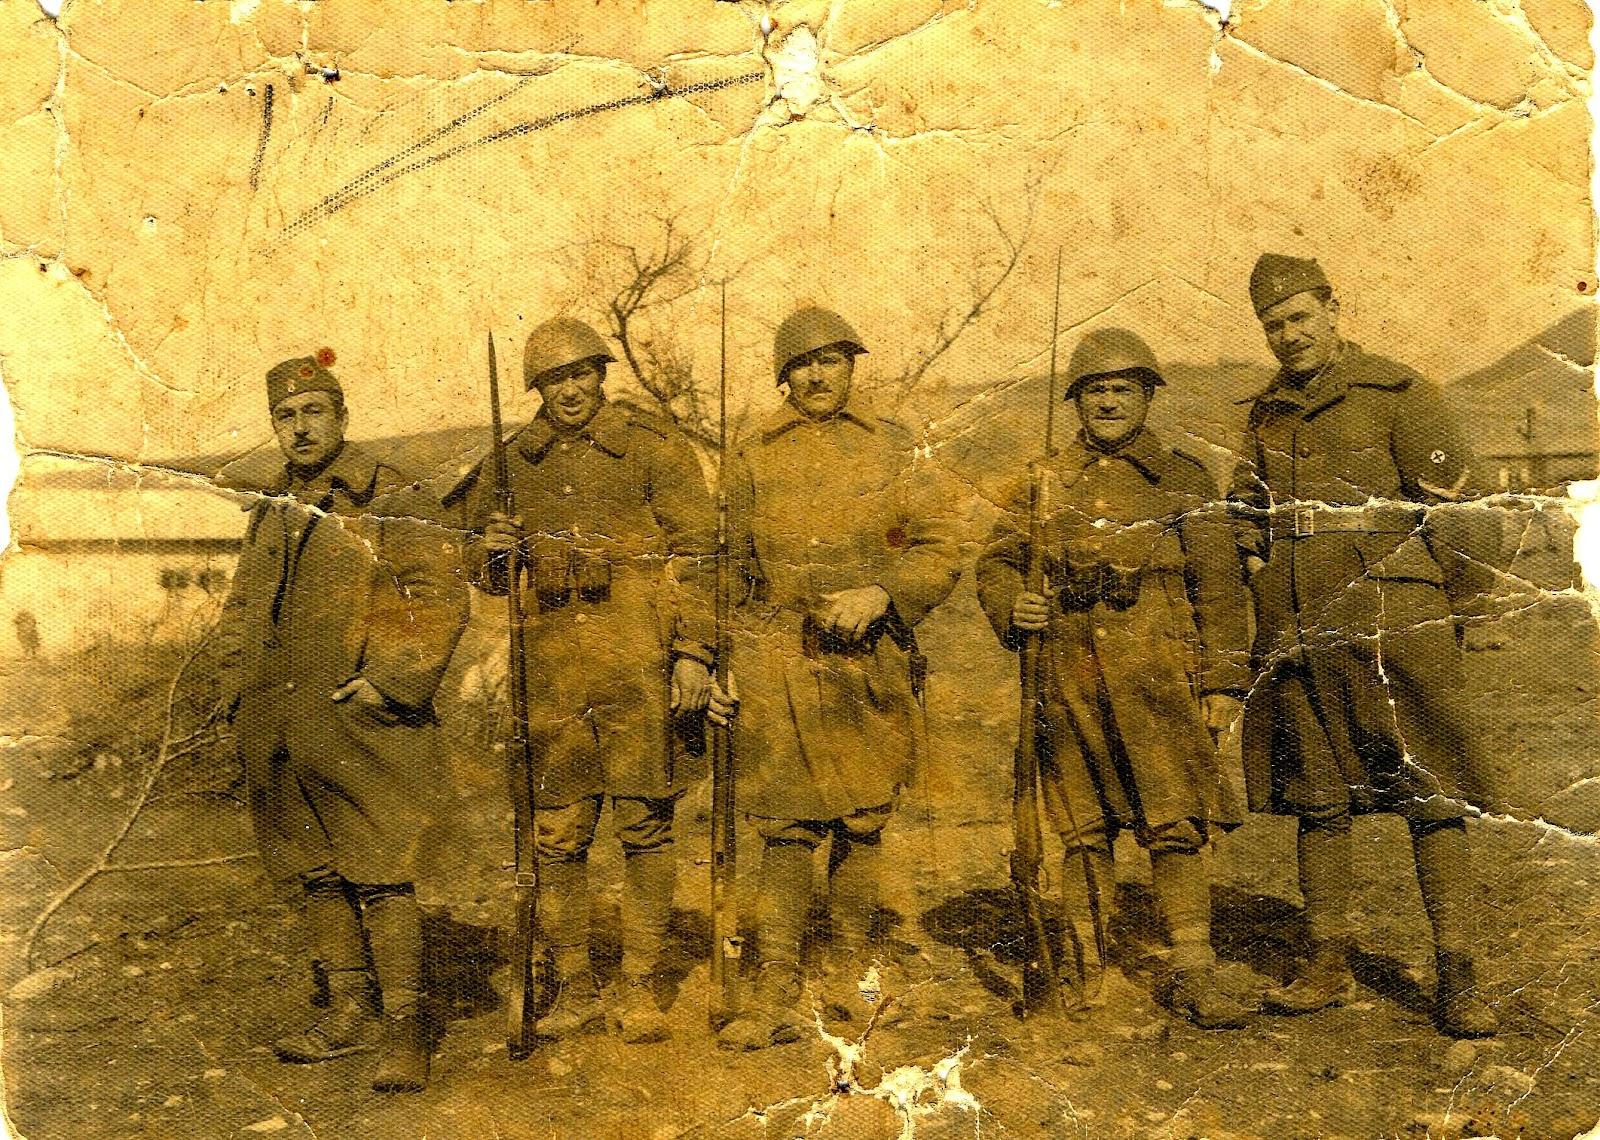 Lexar:ΕΛΑΝ ΜΙΚΡΕΣ ΦΩΤ:Ιερισσιώτες στην Αλβανία το 1940:1941 Αλβανία Βασίλης Πασχαλίδης,Γιώργος Χρυσούλης,Νικόλαος Κατσαντώνης,Στεργιανός Τσαμανδάνης,Γιάννης Τερτυλίνης 2 αντίγραφο.JPG